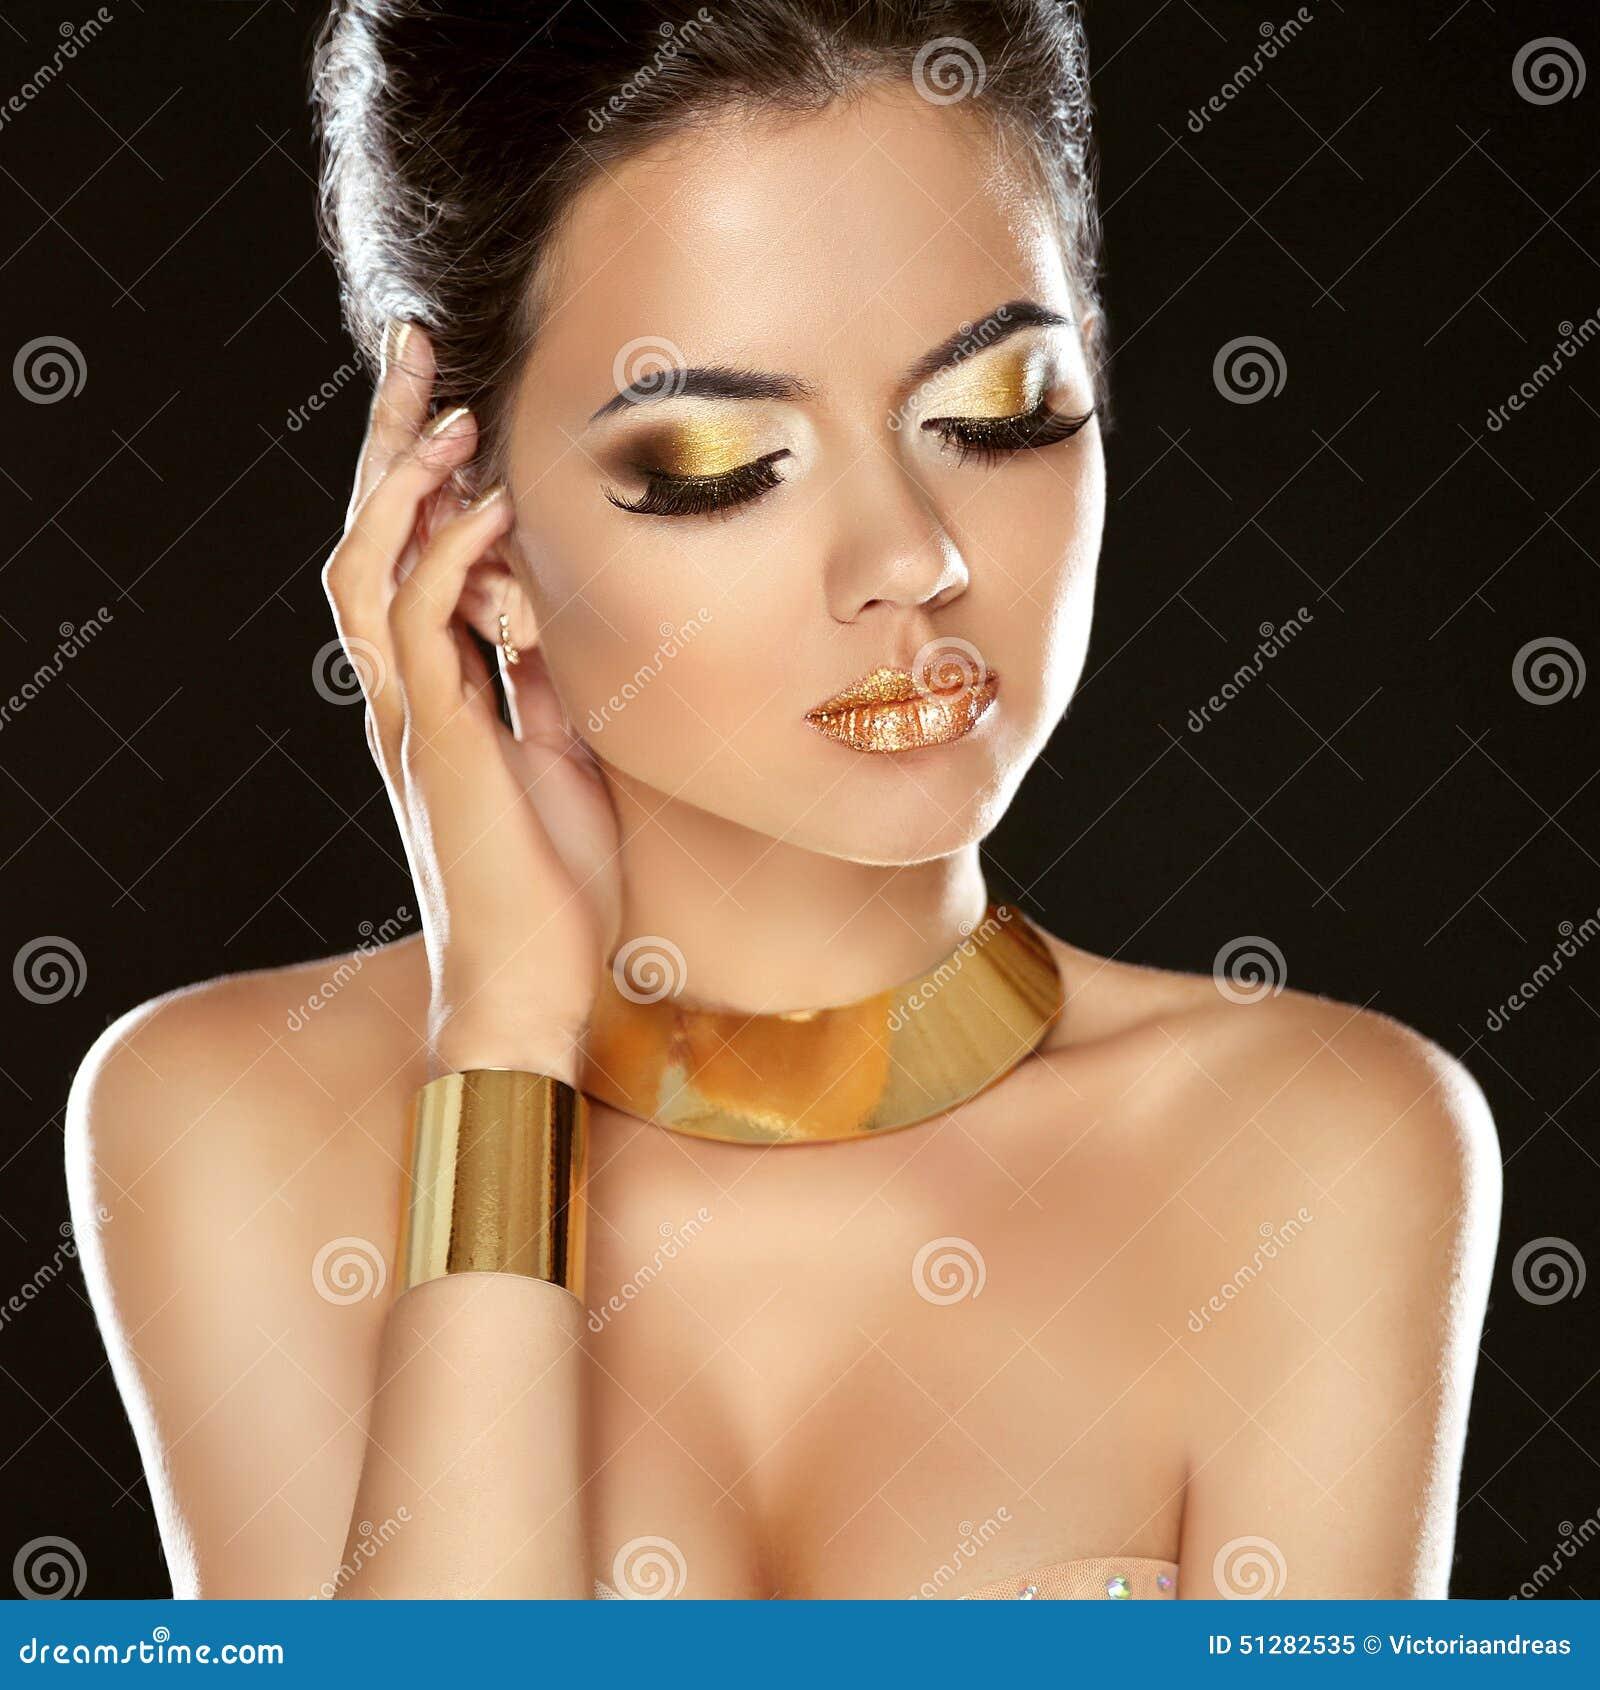 Fashion Beauty Girl Isolated On Black Background Golden